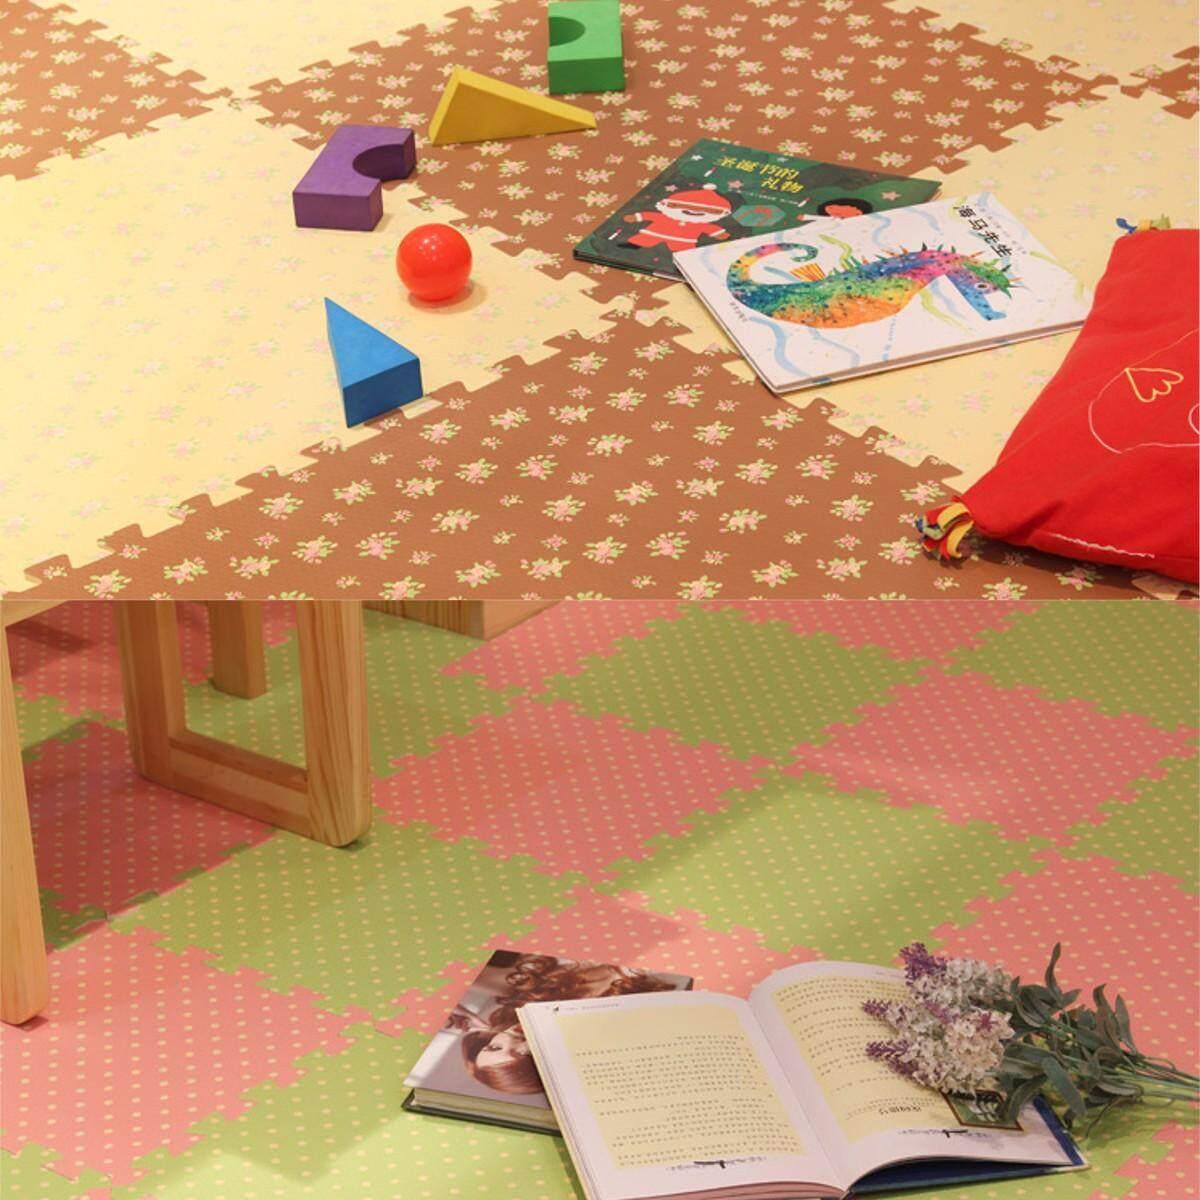 4Pcs Eva Soft Foam Floor Interlocking Mat 24 Baby Room Crawl Play House .